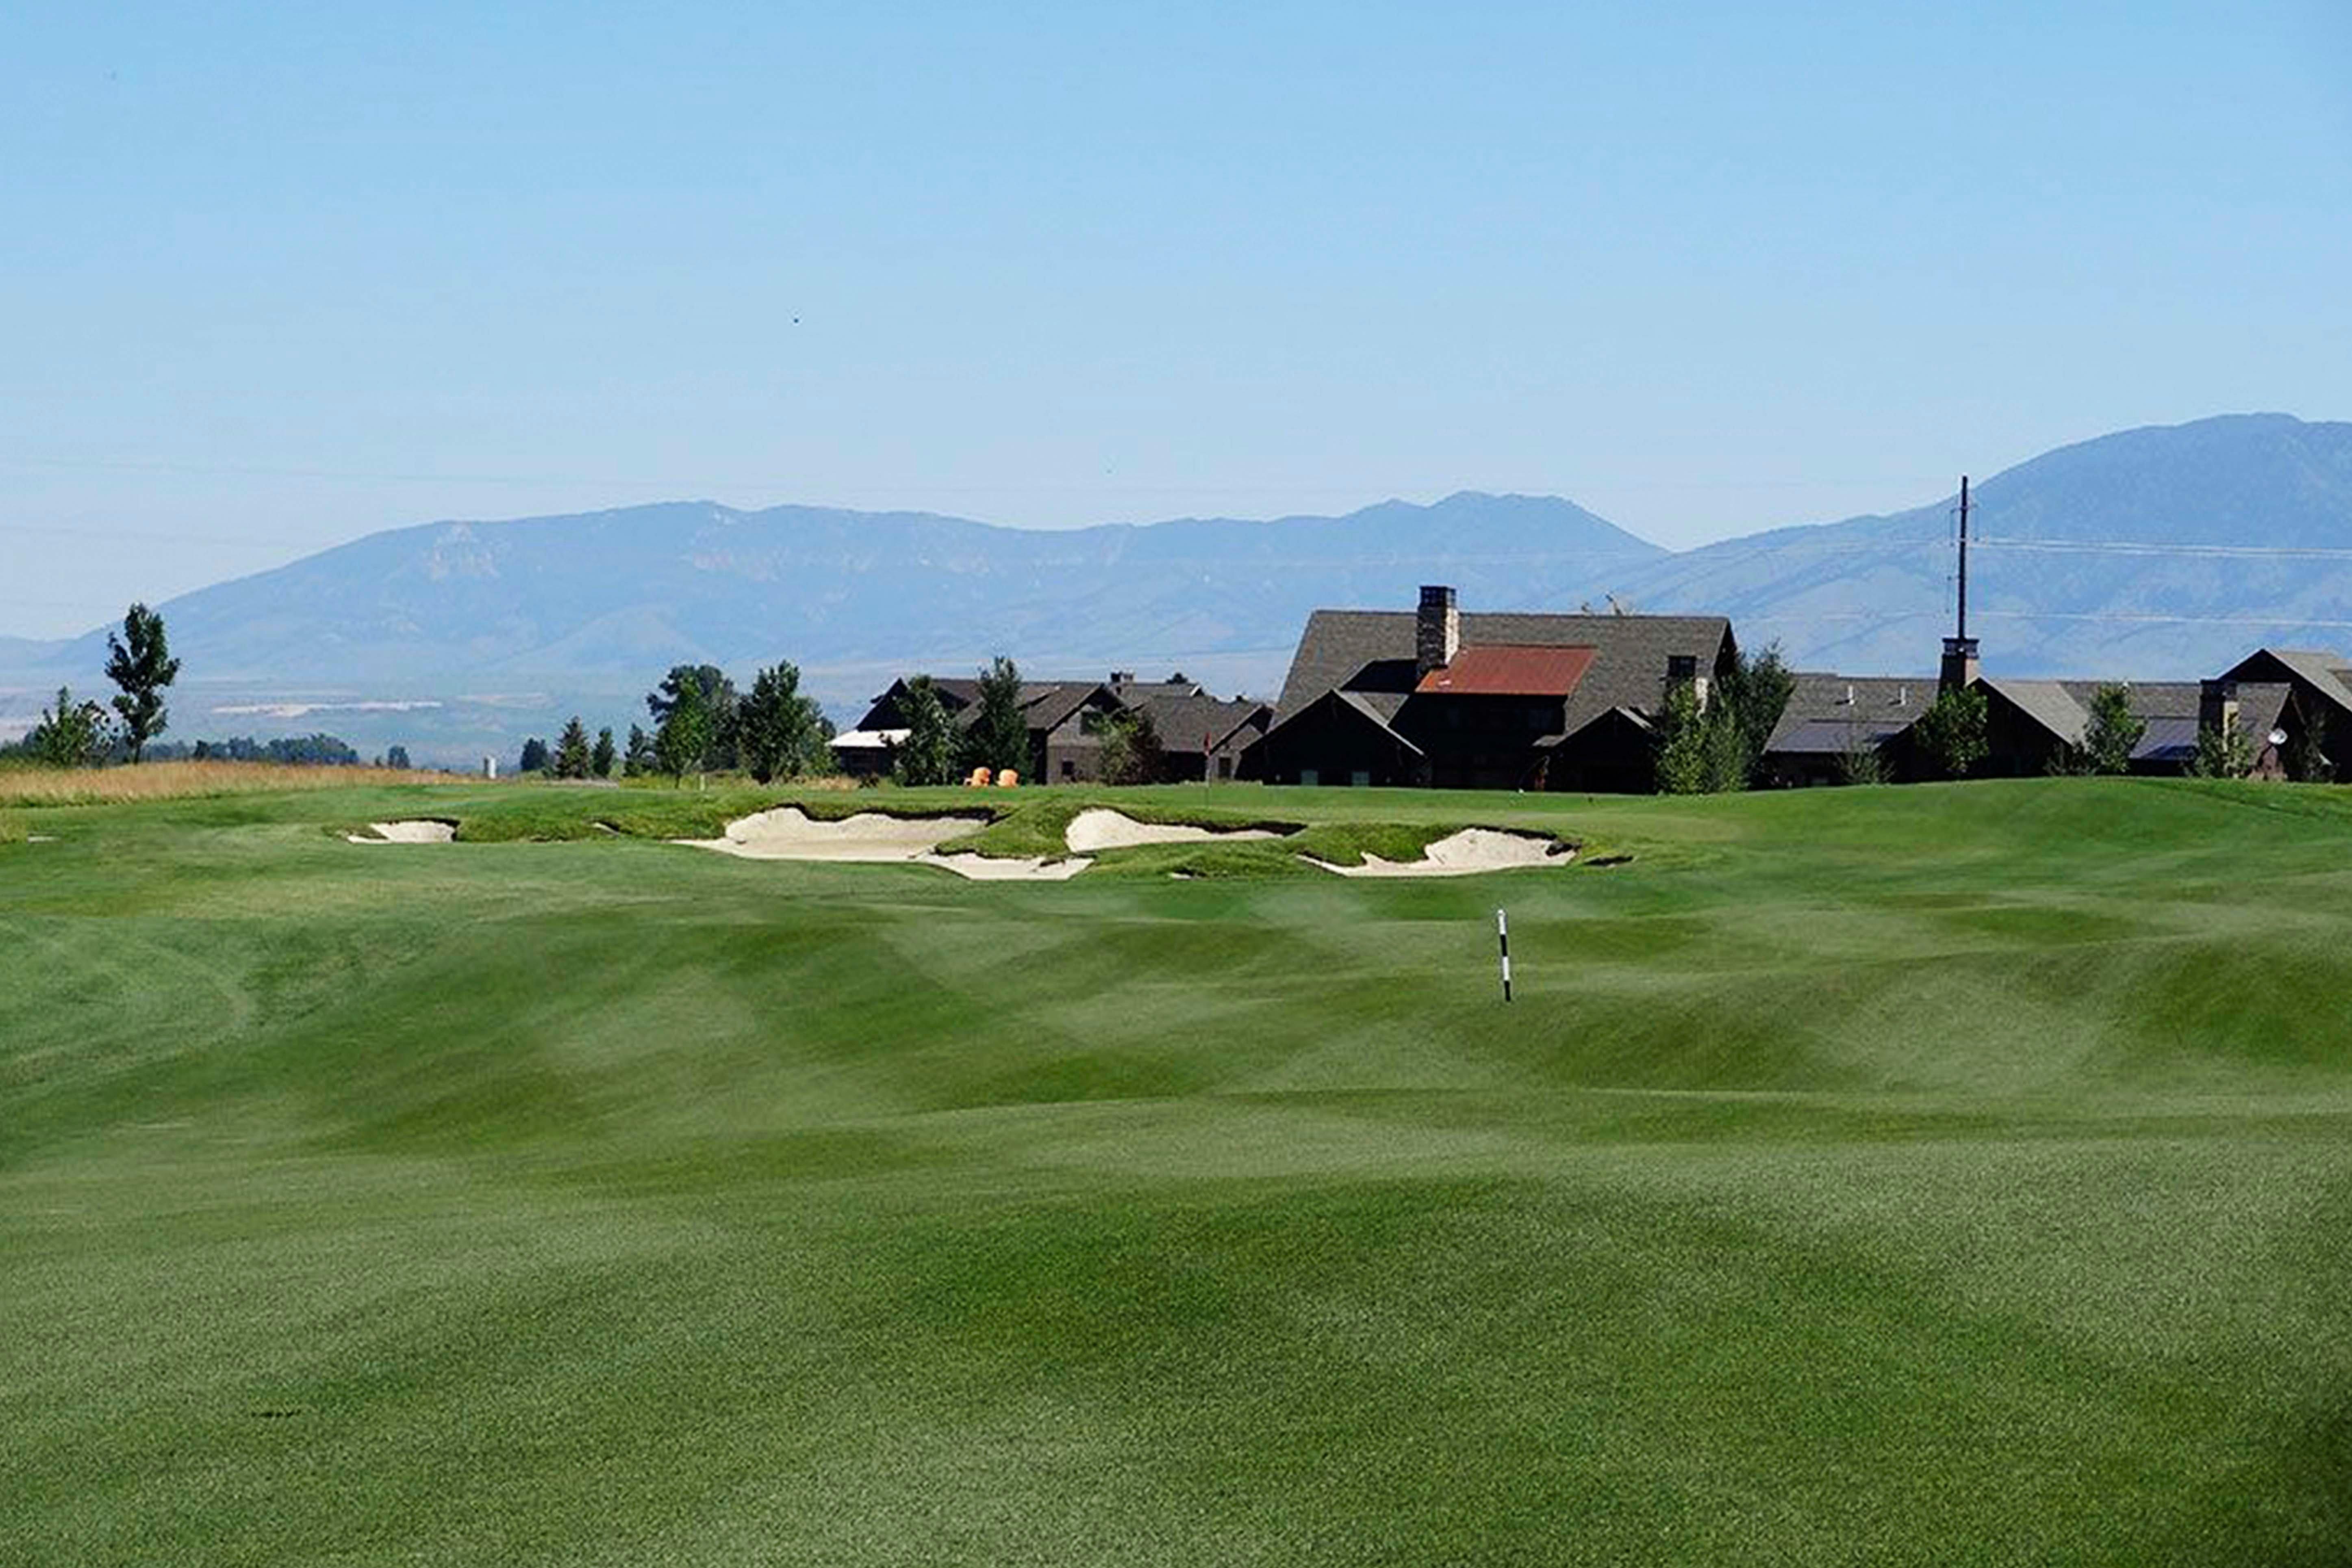 Black Bull Golf Course in Bozeman, Montana